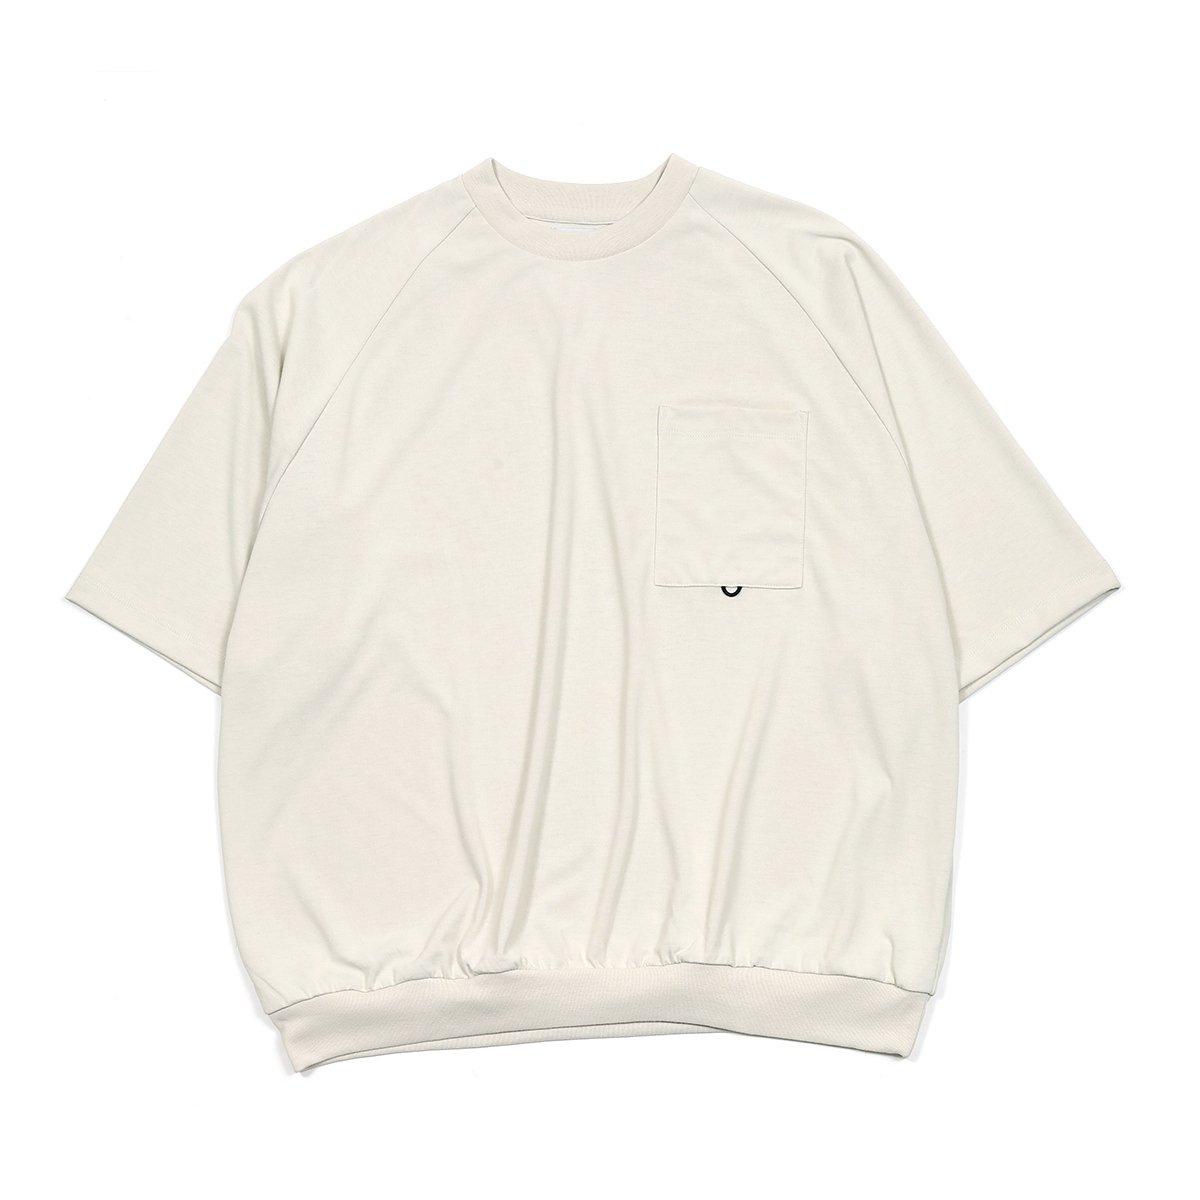 Short Sleeve RIB T-shirts 詳細画像15